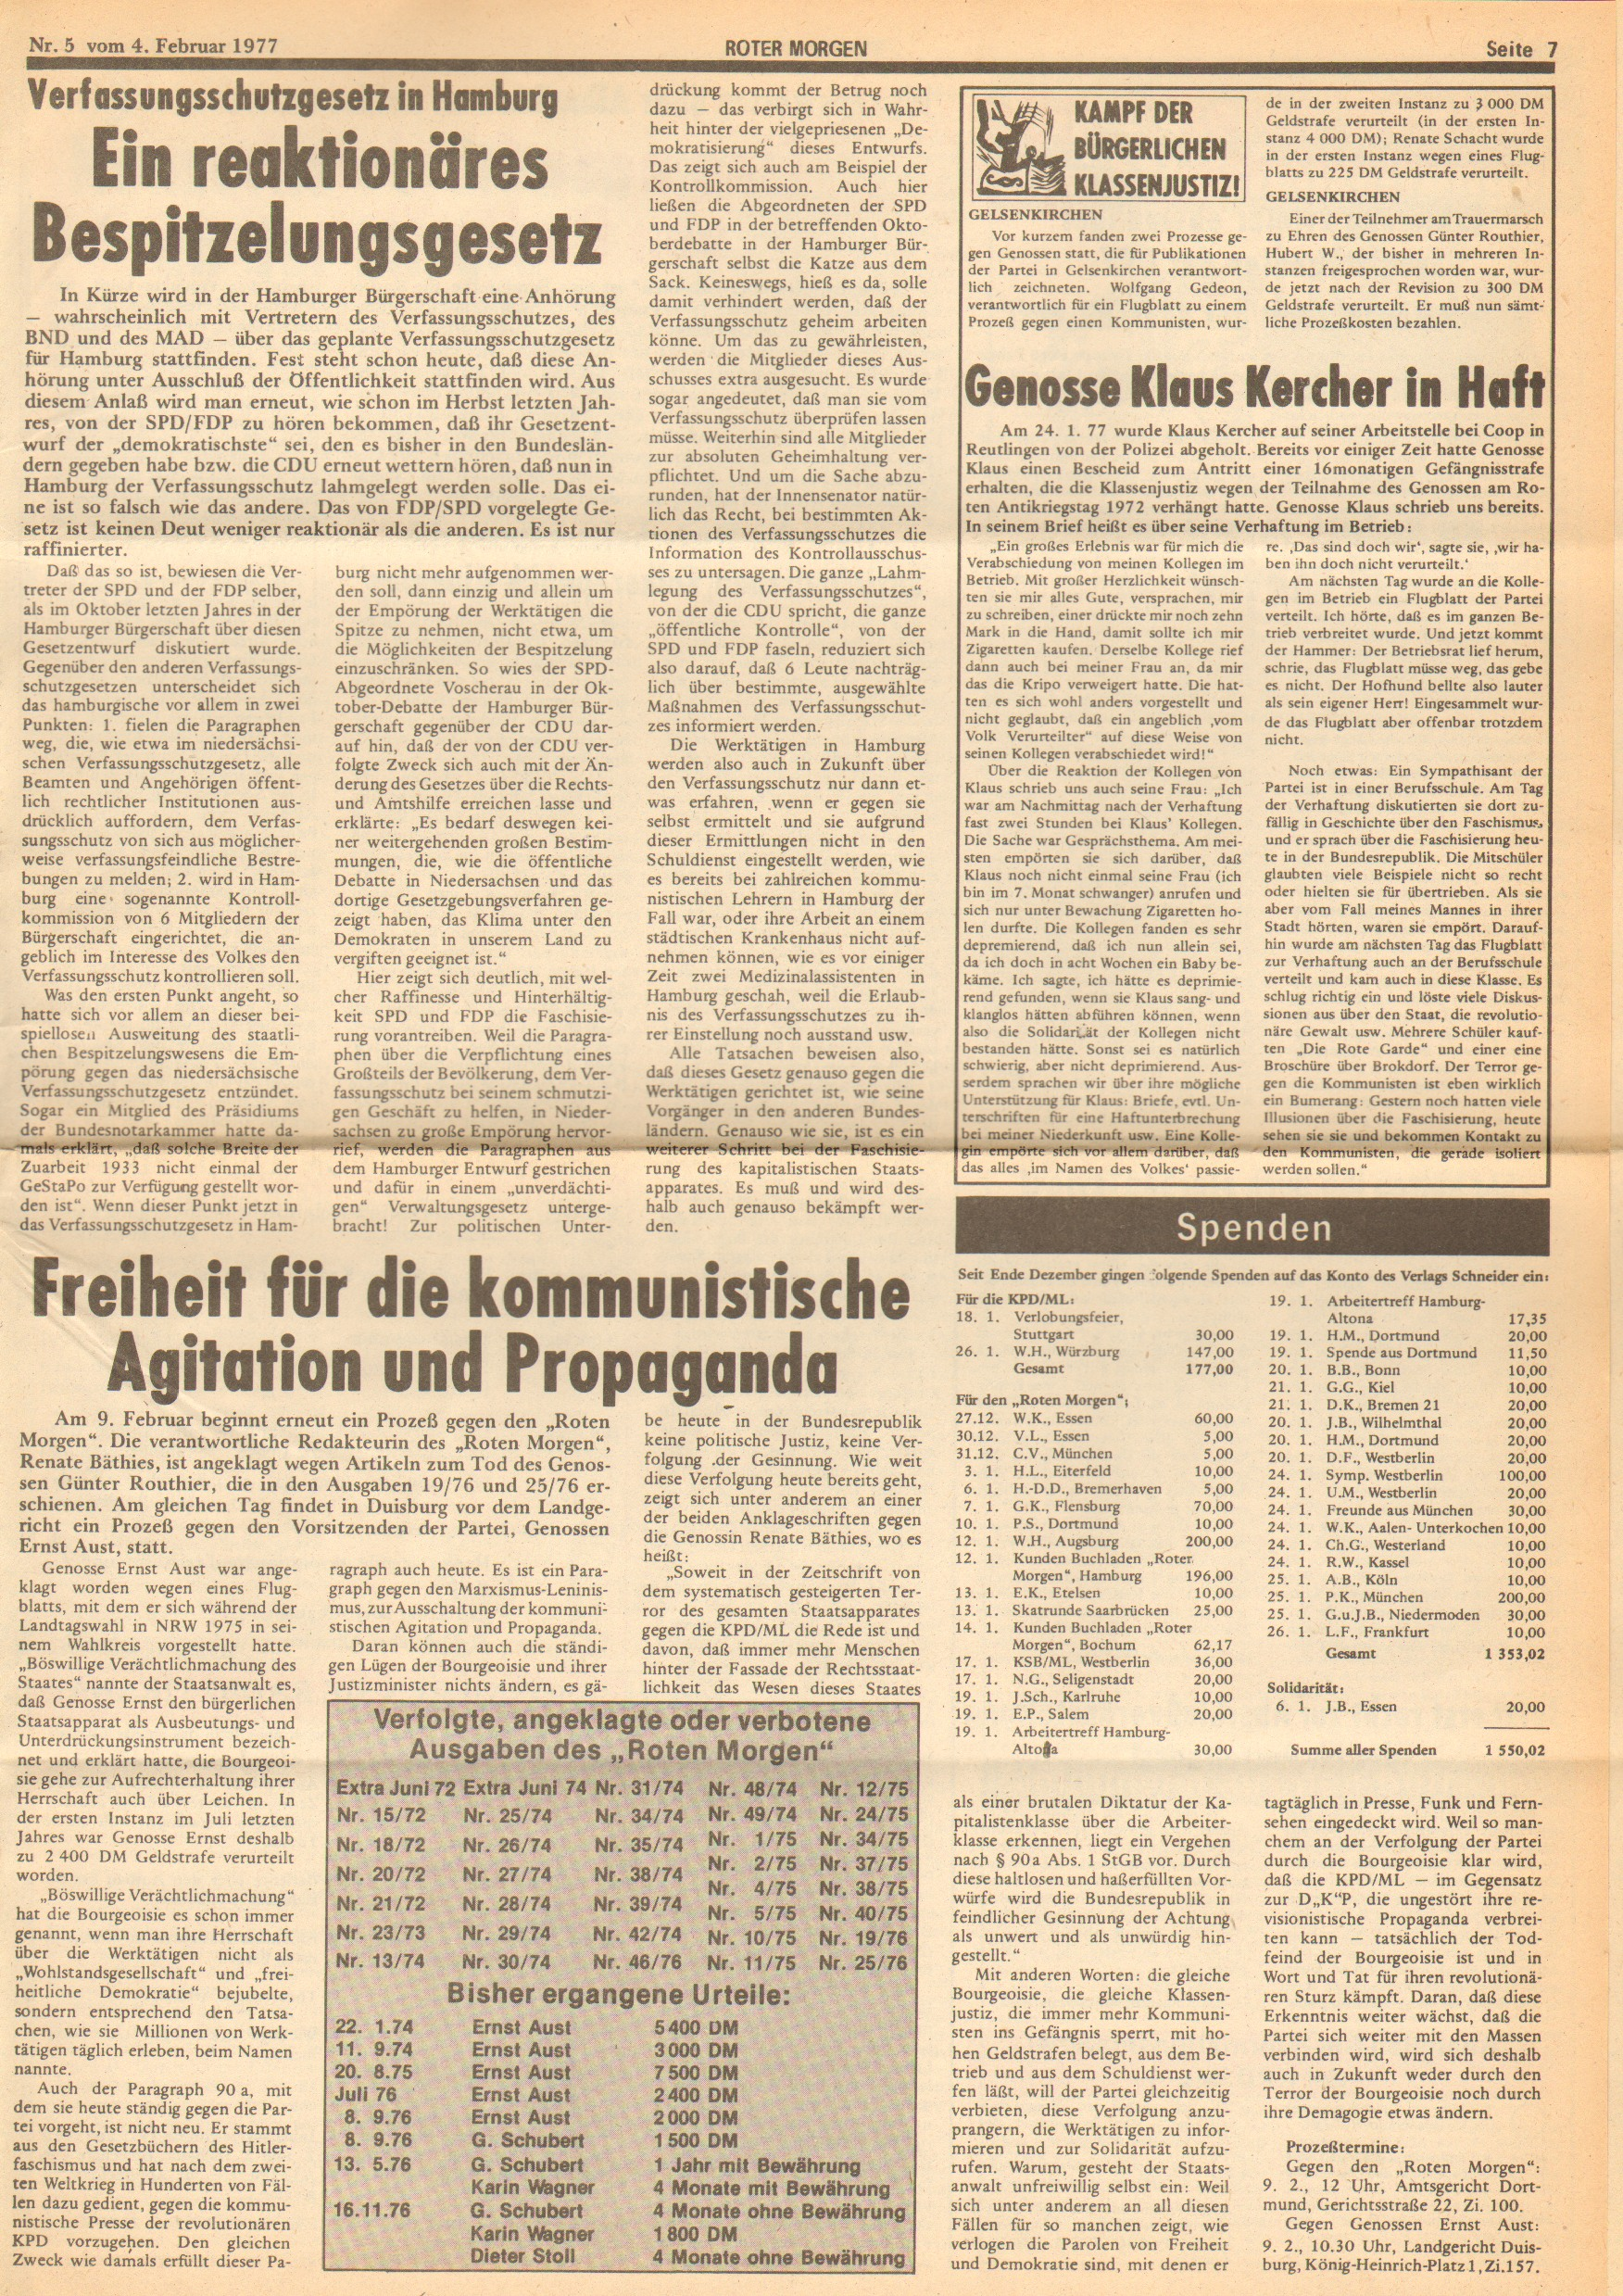 Roter Morgen, 11. Jg., 4. Februar 1977, Nr. 5, Seite 7